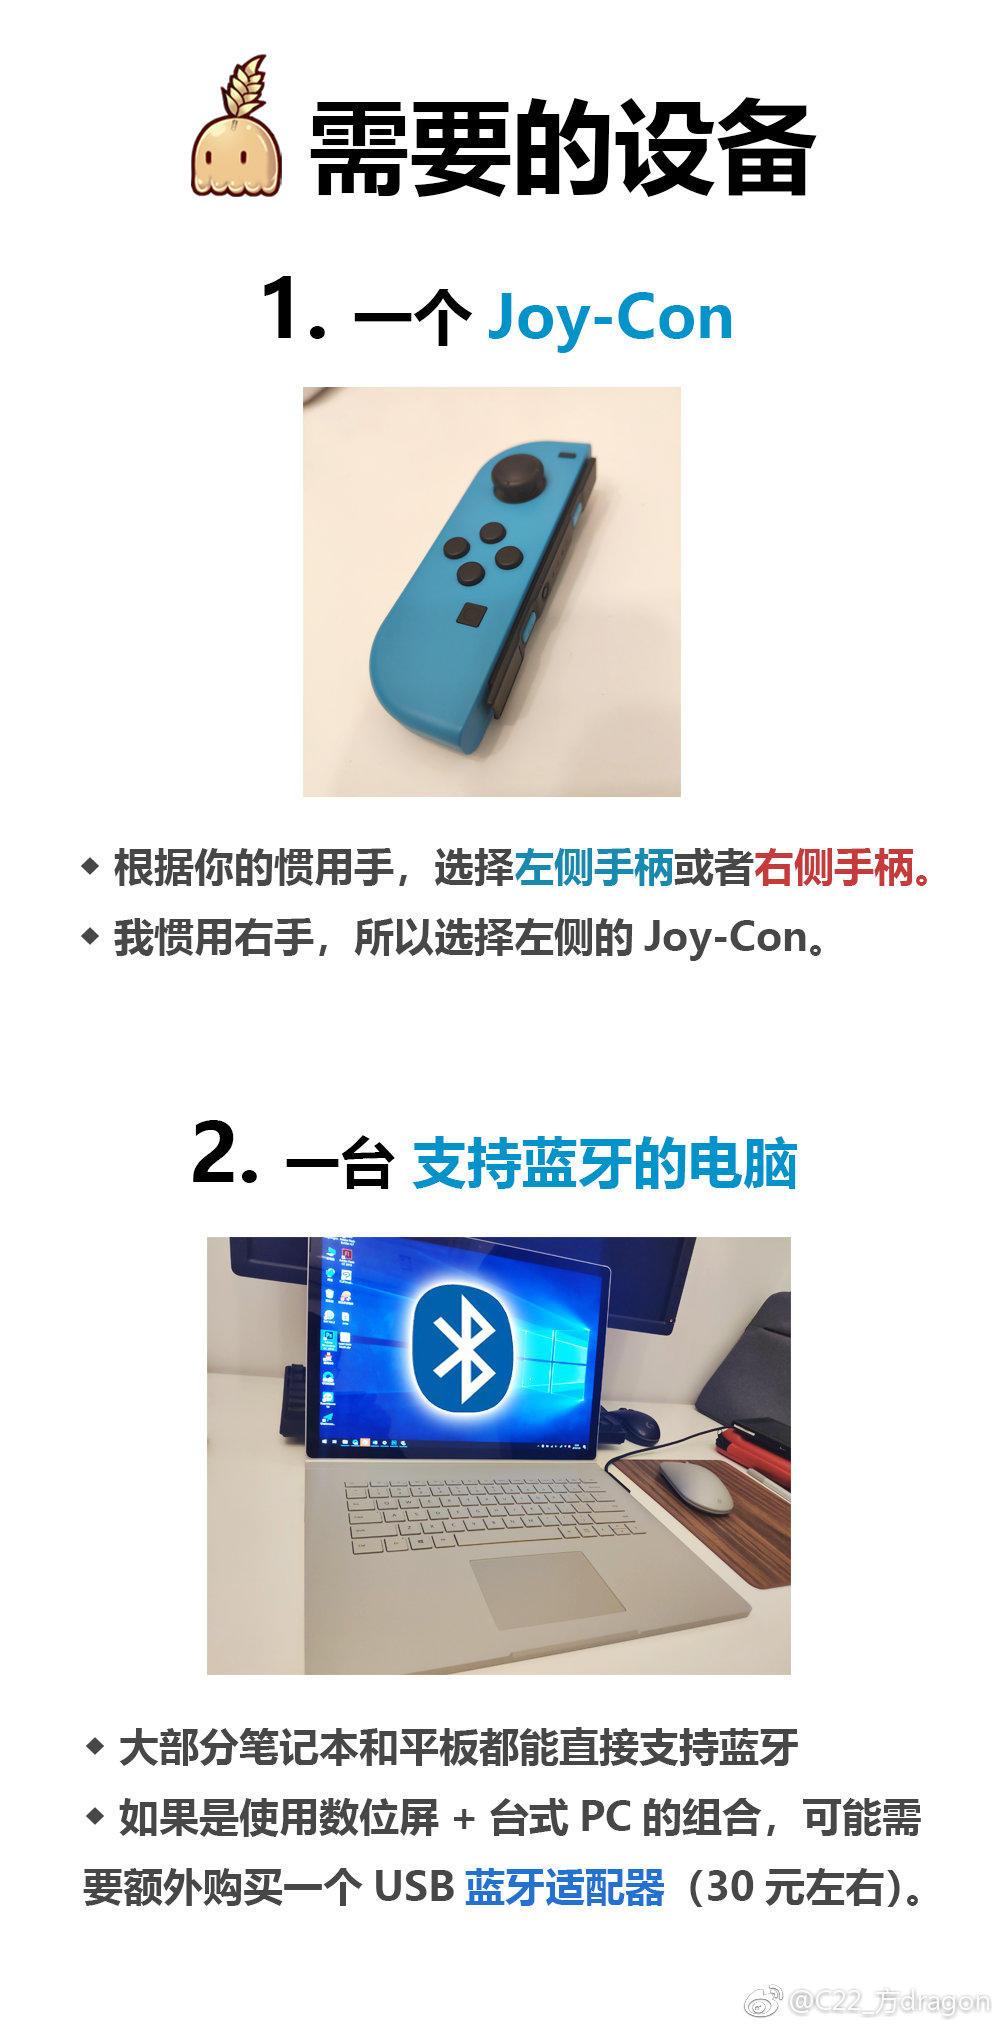 C22_方dragon:昨天看到有人安利左手键盘,这里给有Switch 的绘